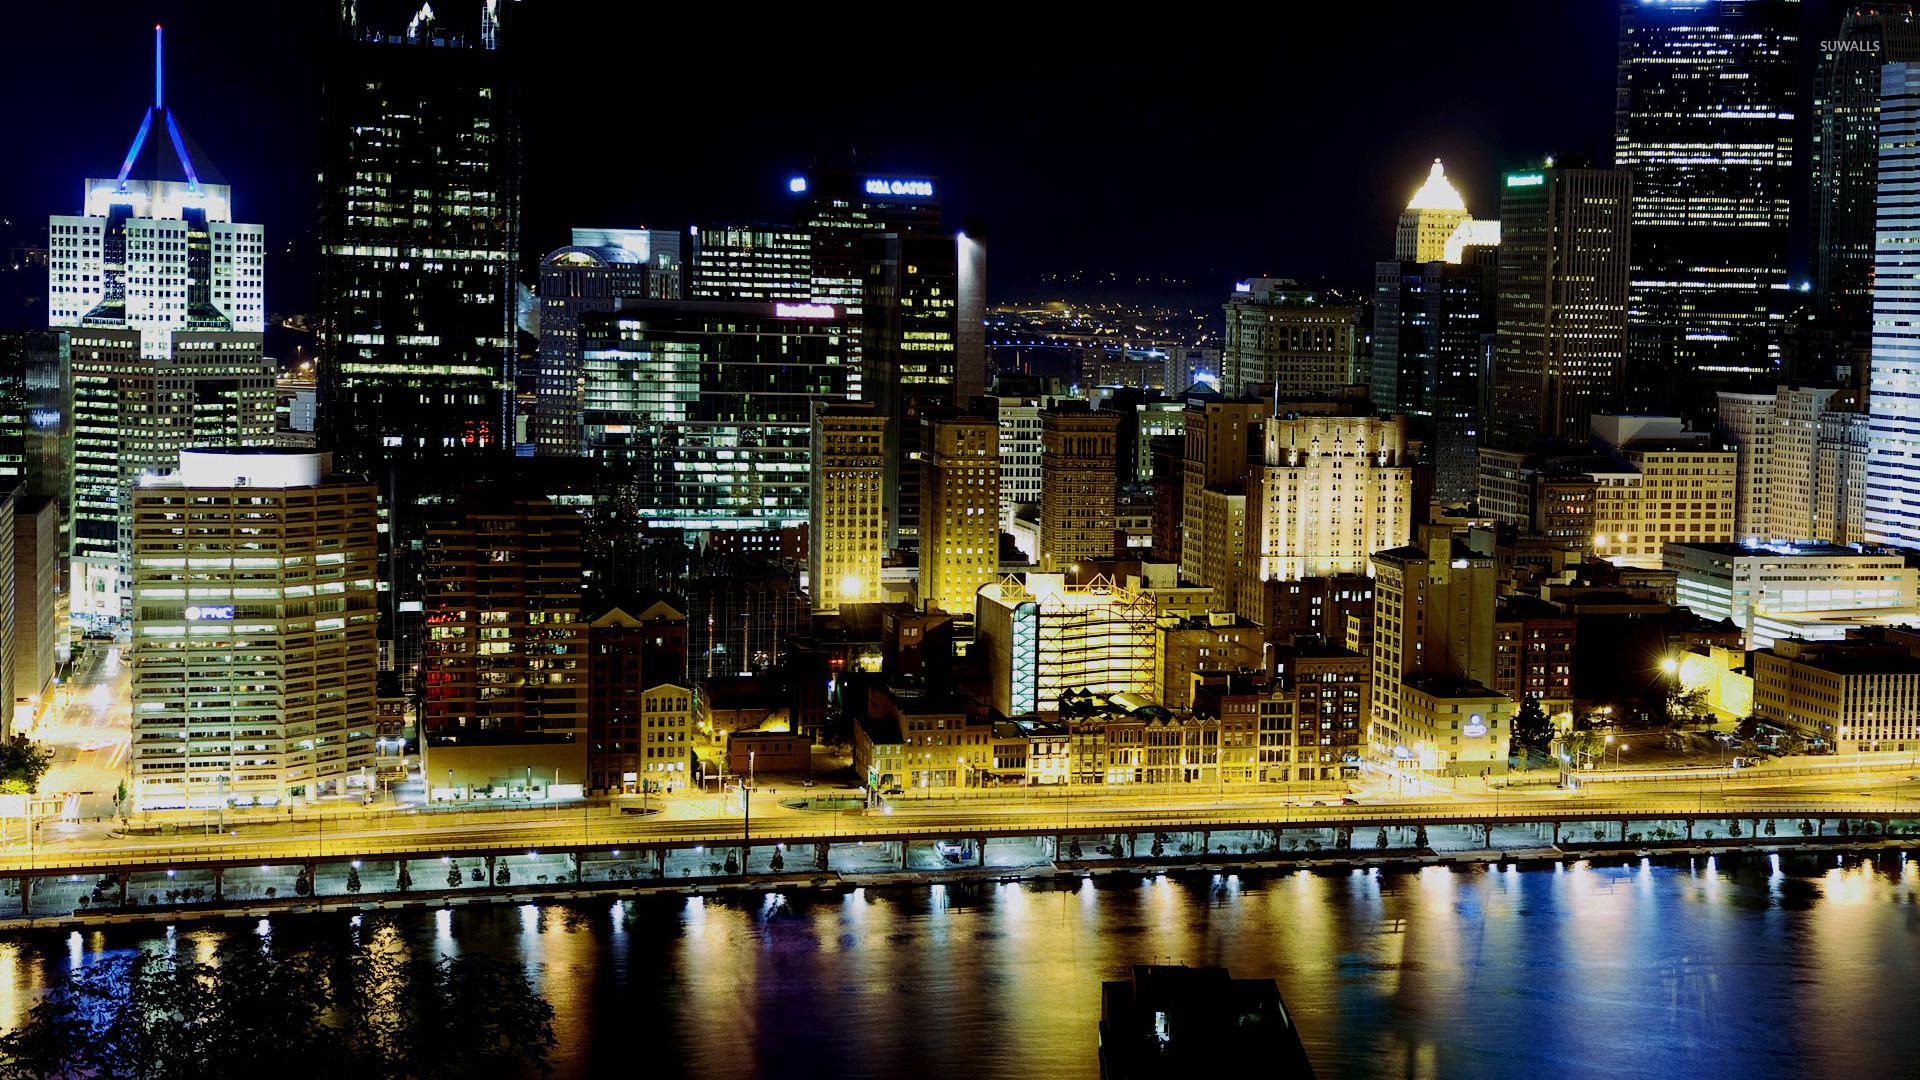 Steelers Wallpaper Hd Pittsburgh Skyline Wallpaper World Wallpapers 30311